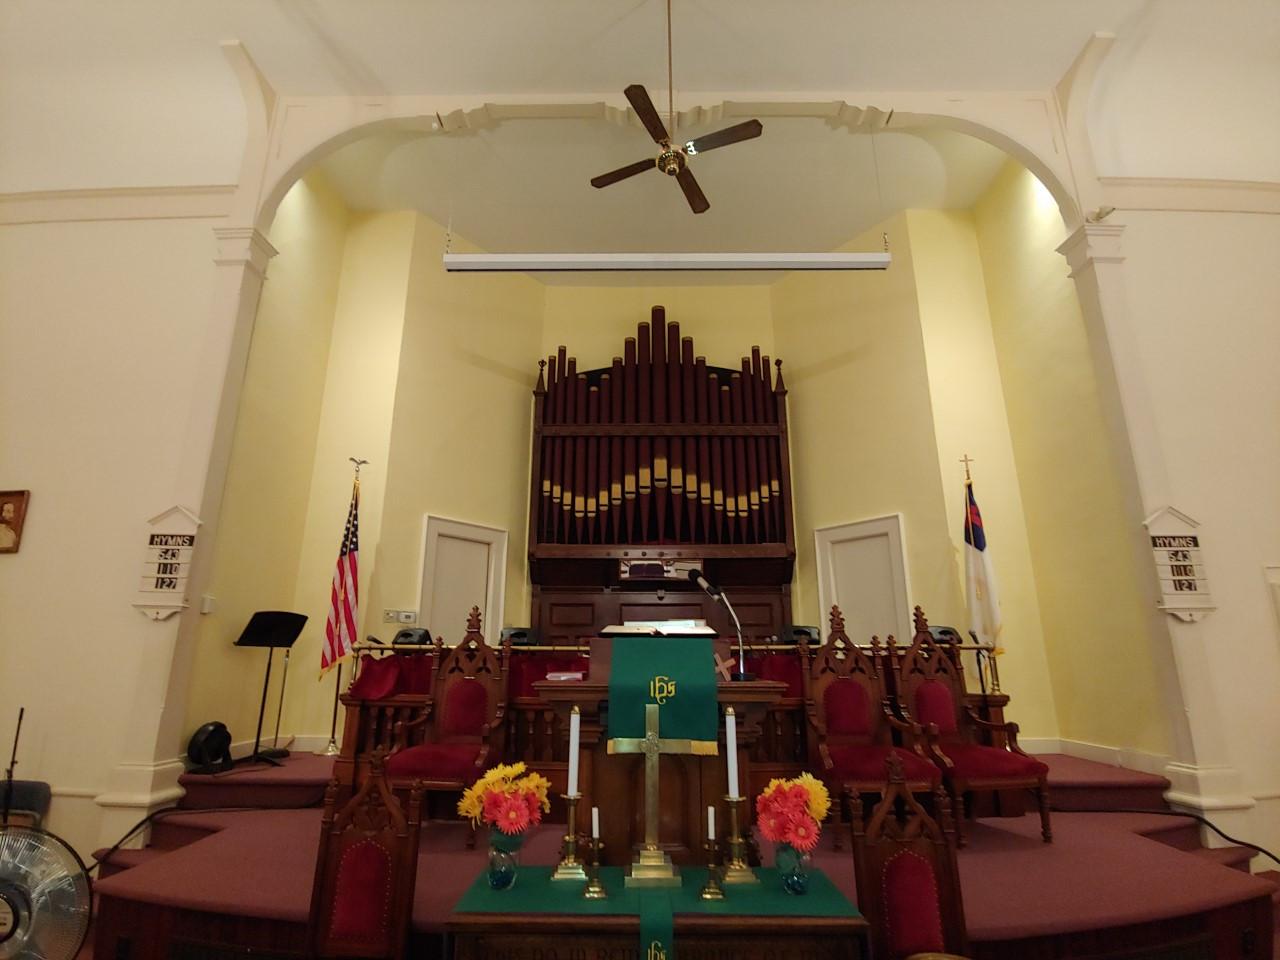 Sanctuary with organ.jpg